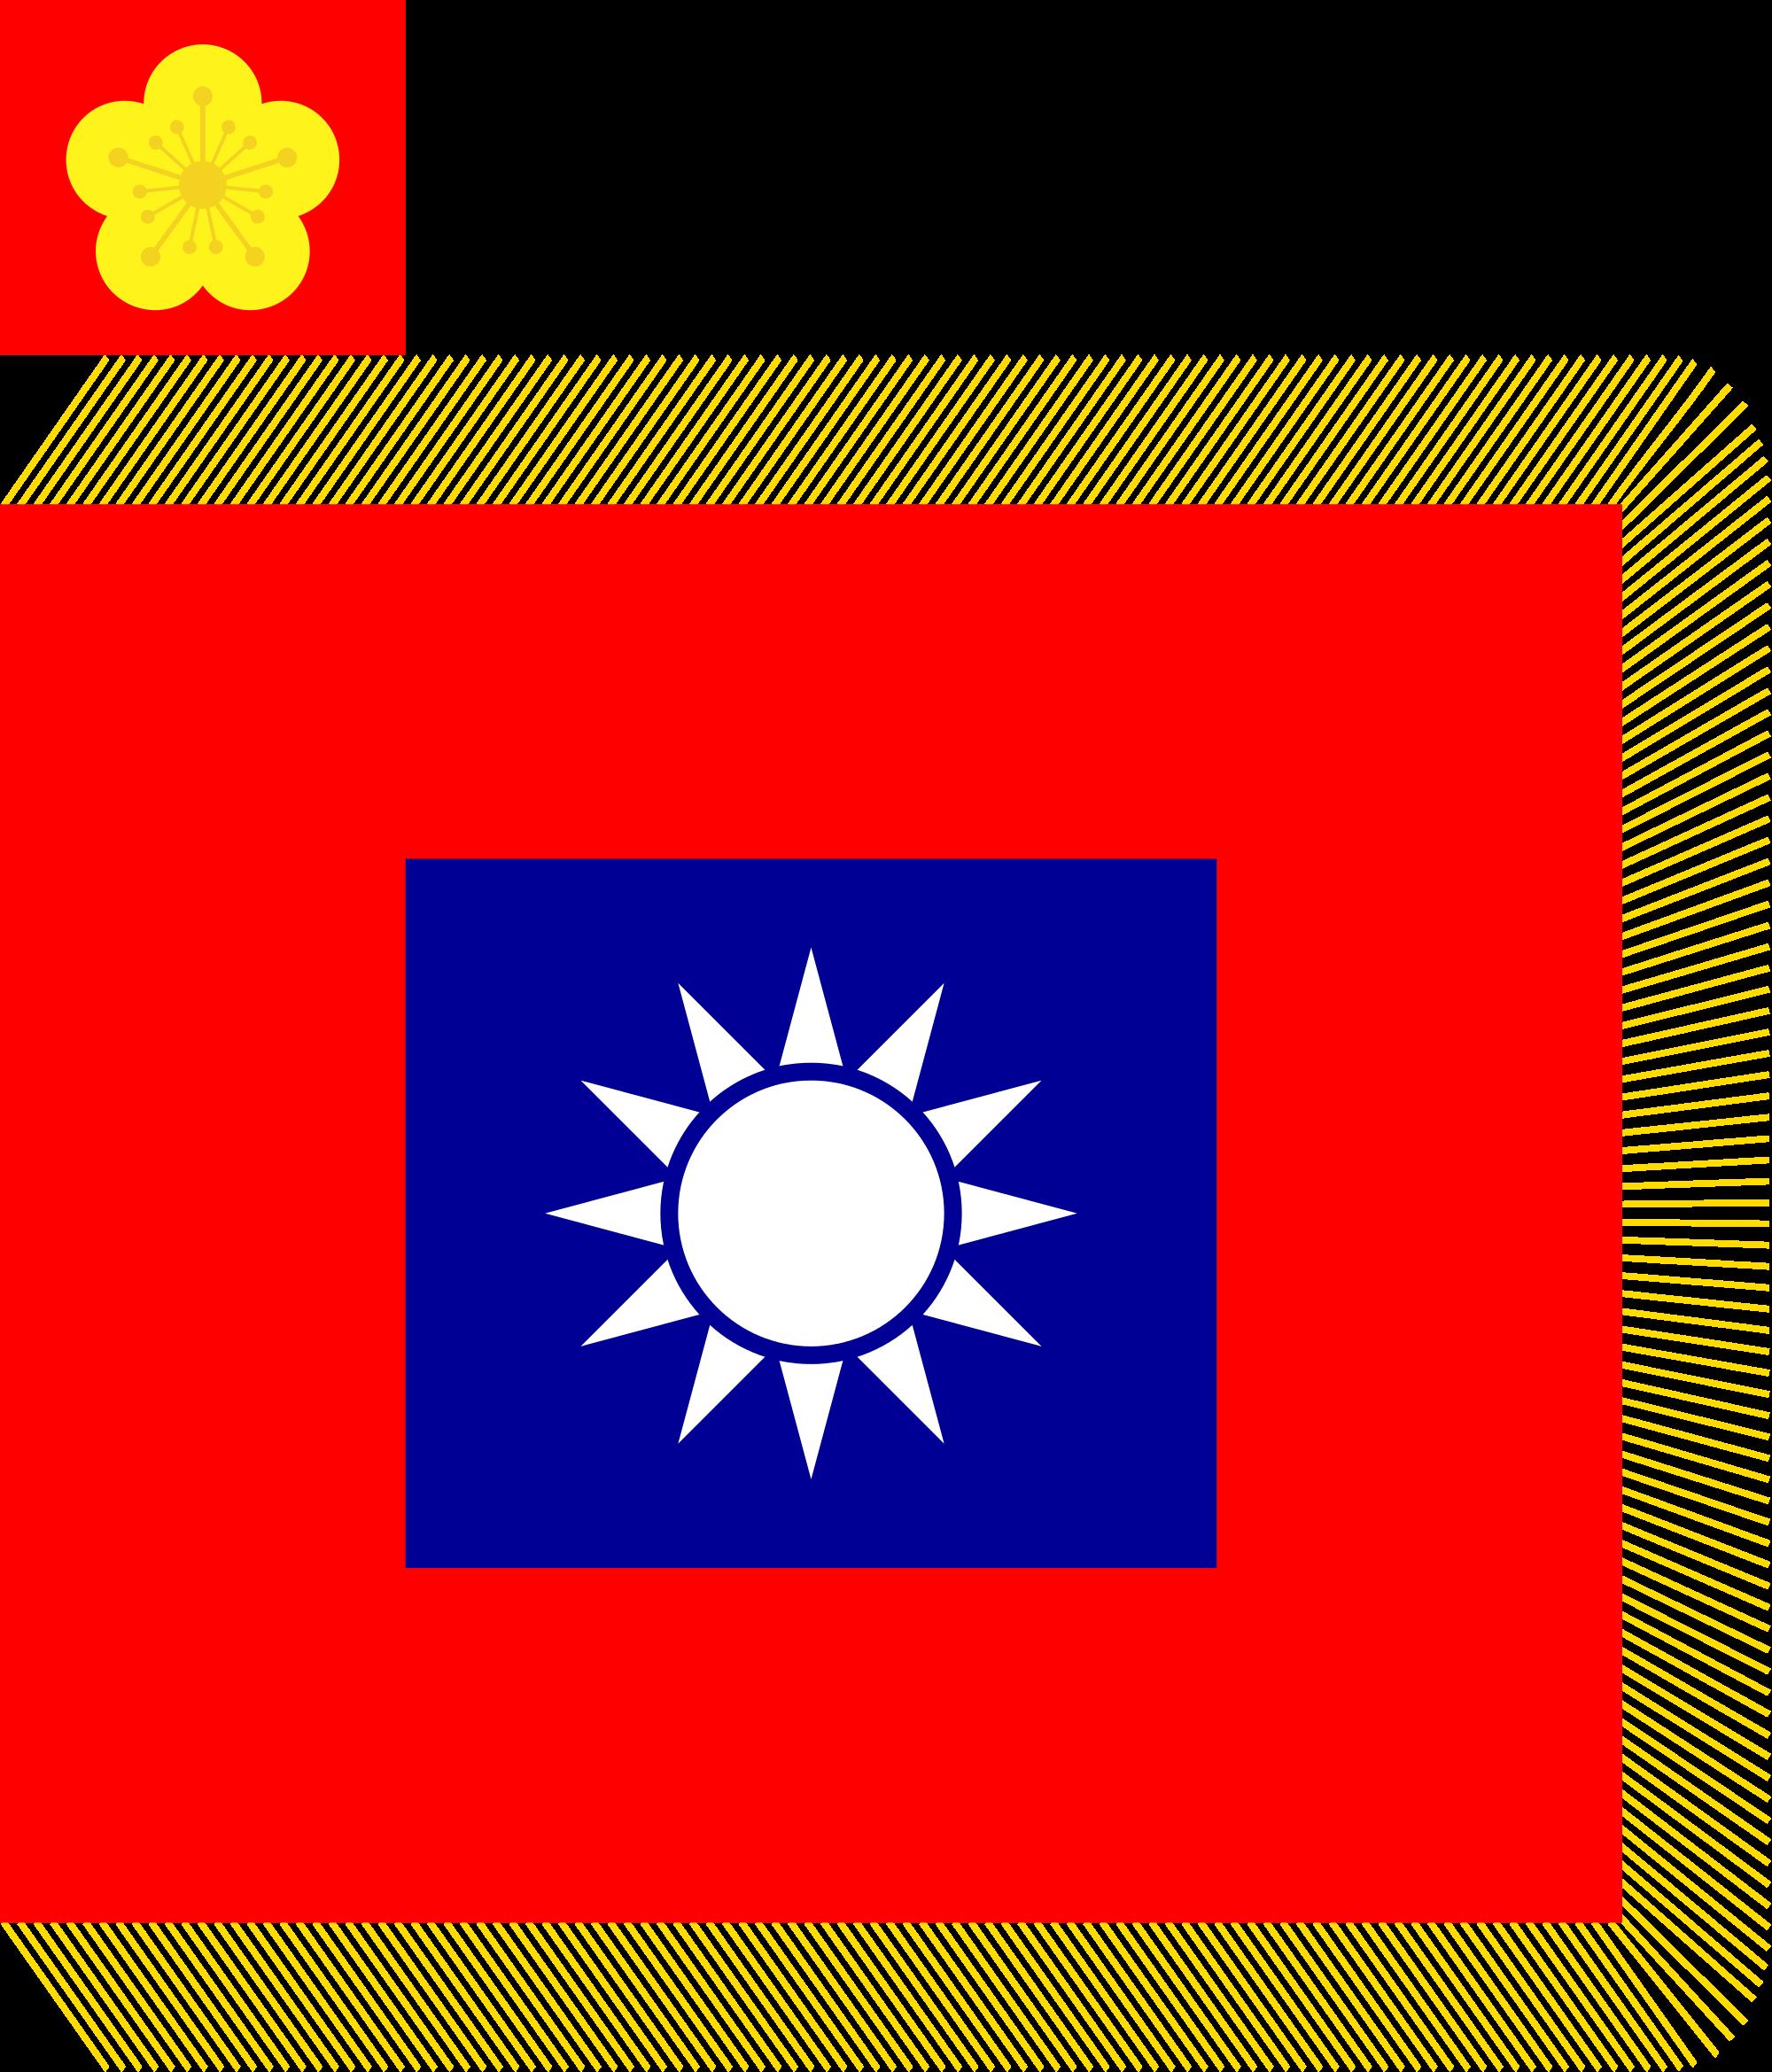 Republic Of China Army Deputy Commander In Chief 1953 Forca Policial Distintivo Brasao